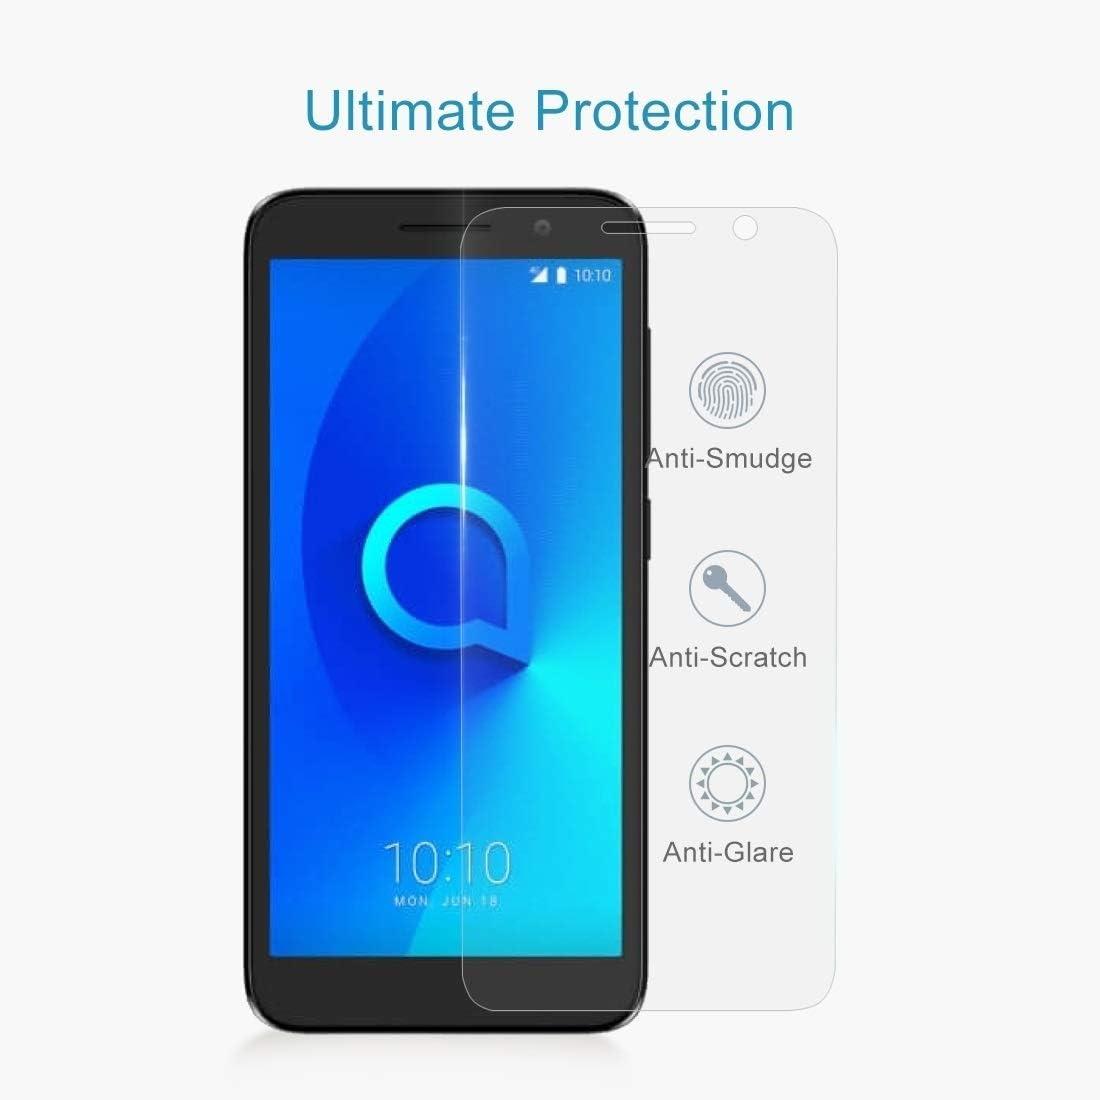 Wangl Mobile Phone Tempered Glass Film 50 PCS 0.26mm 9H 2.5D Tempered Glass Film for Alcatel 1 5033 Tempered Glass Film